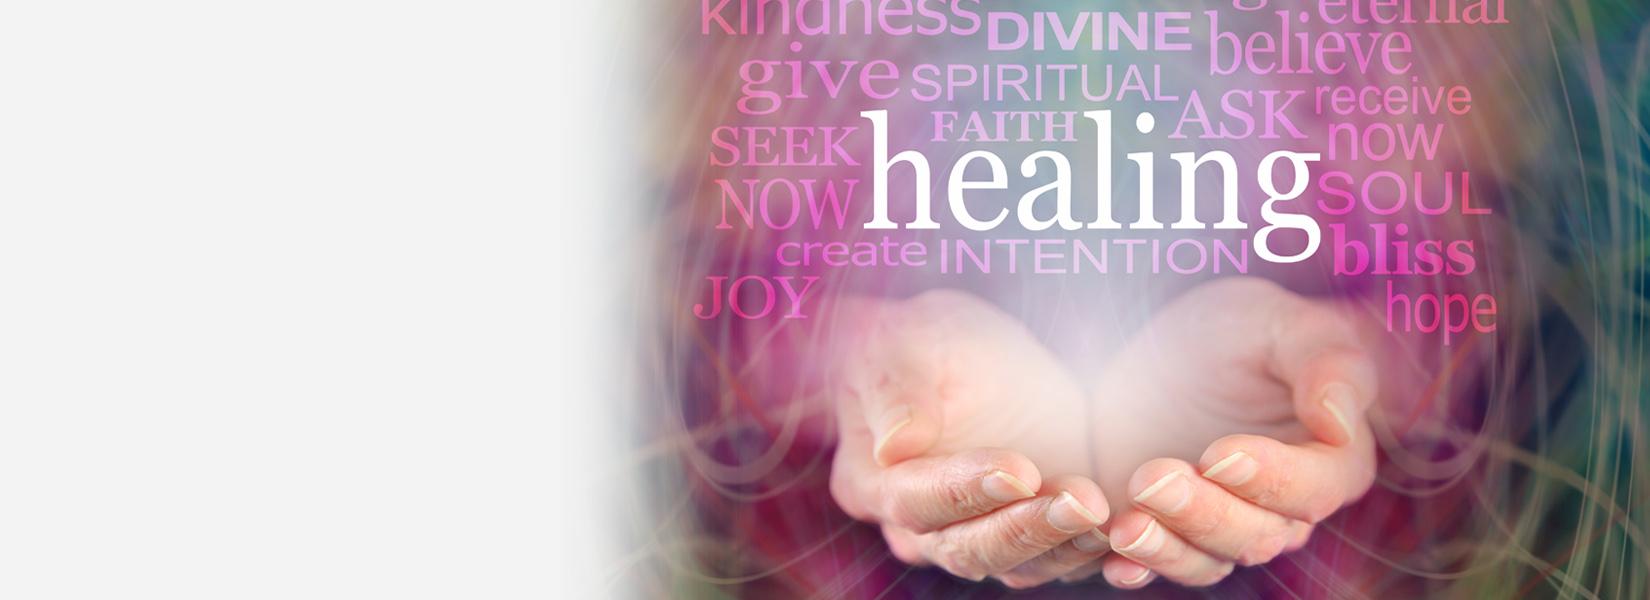 inspirational panel - healing